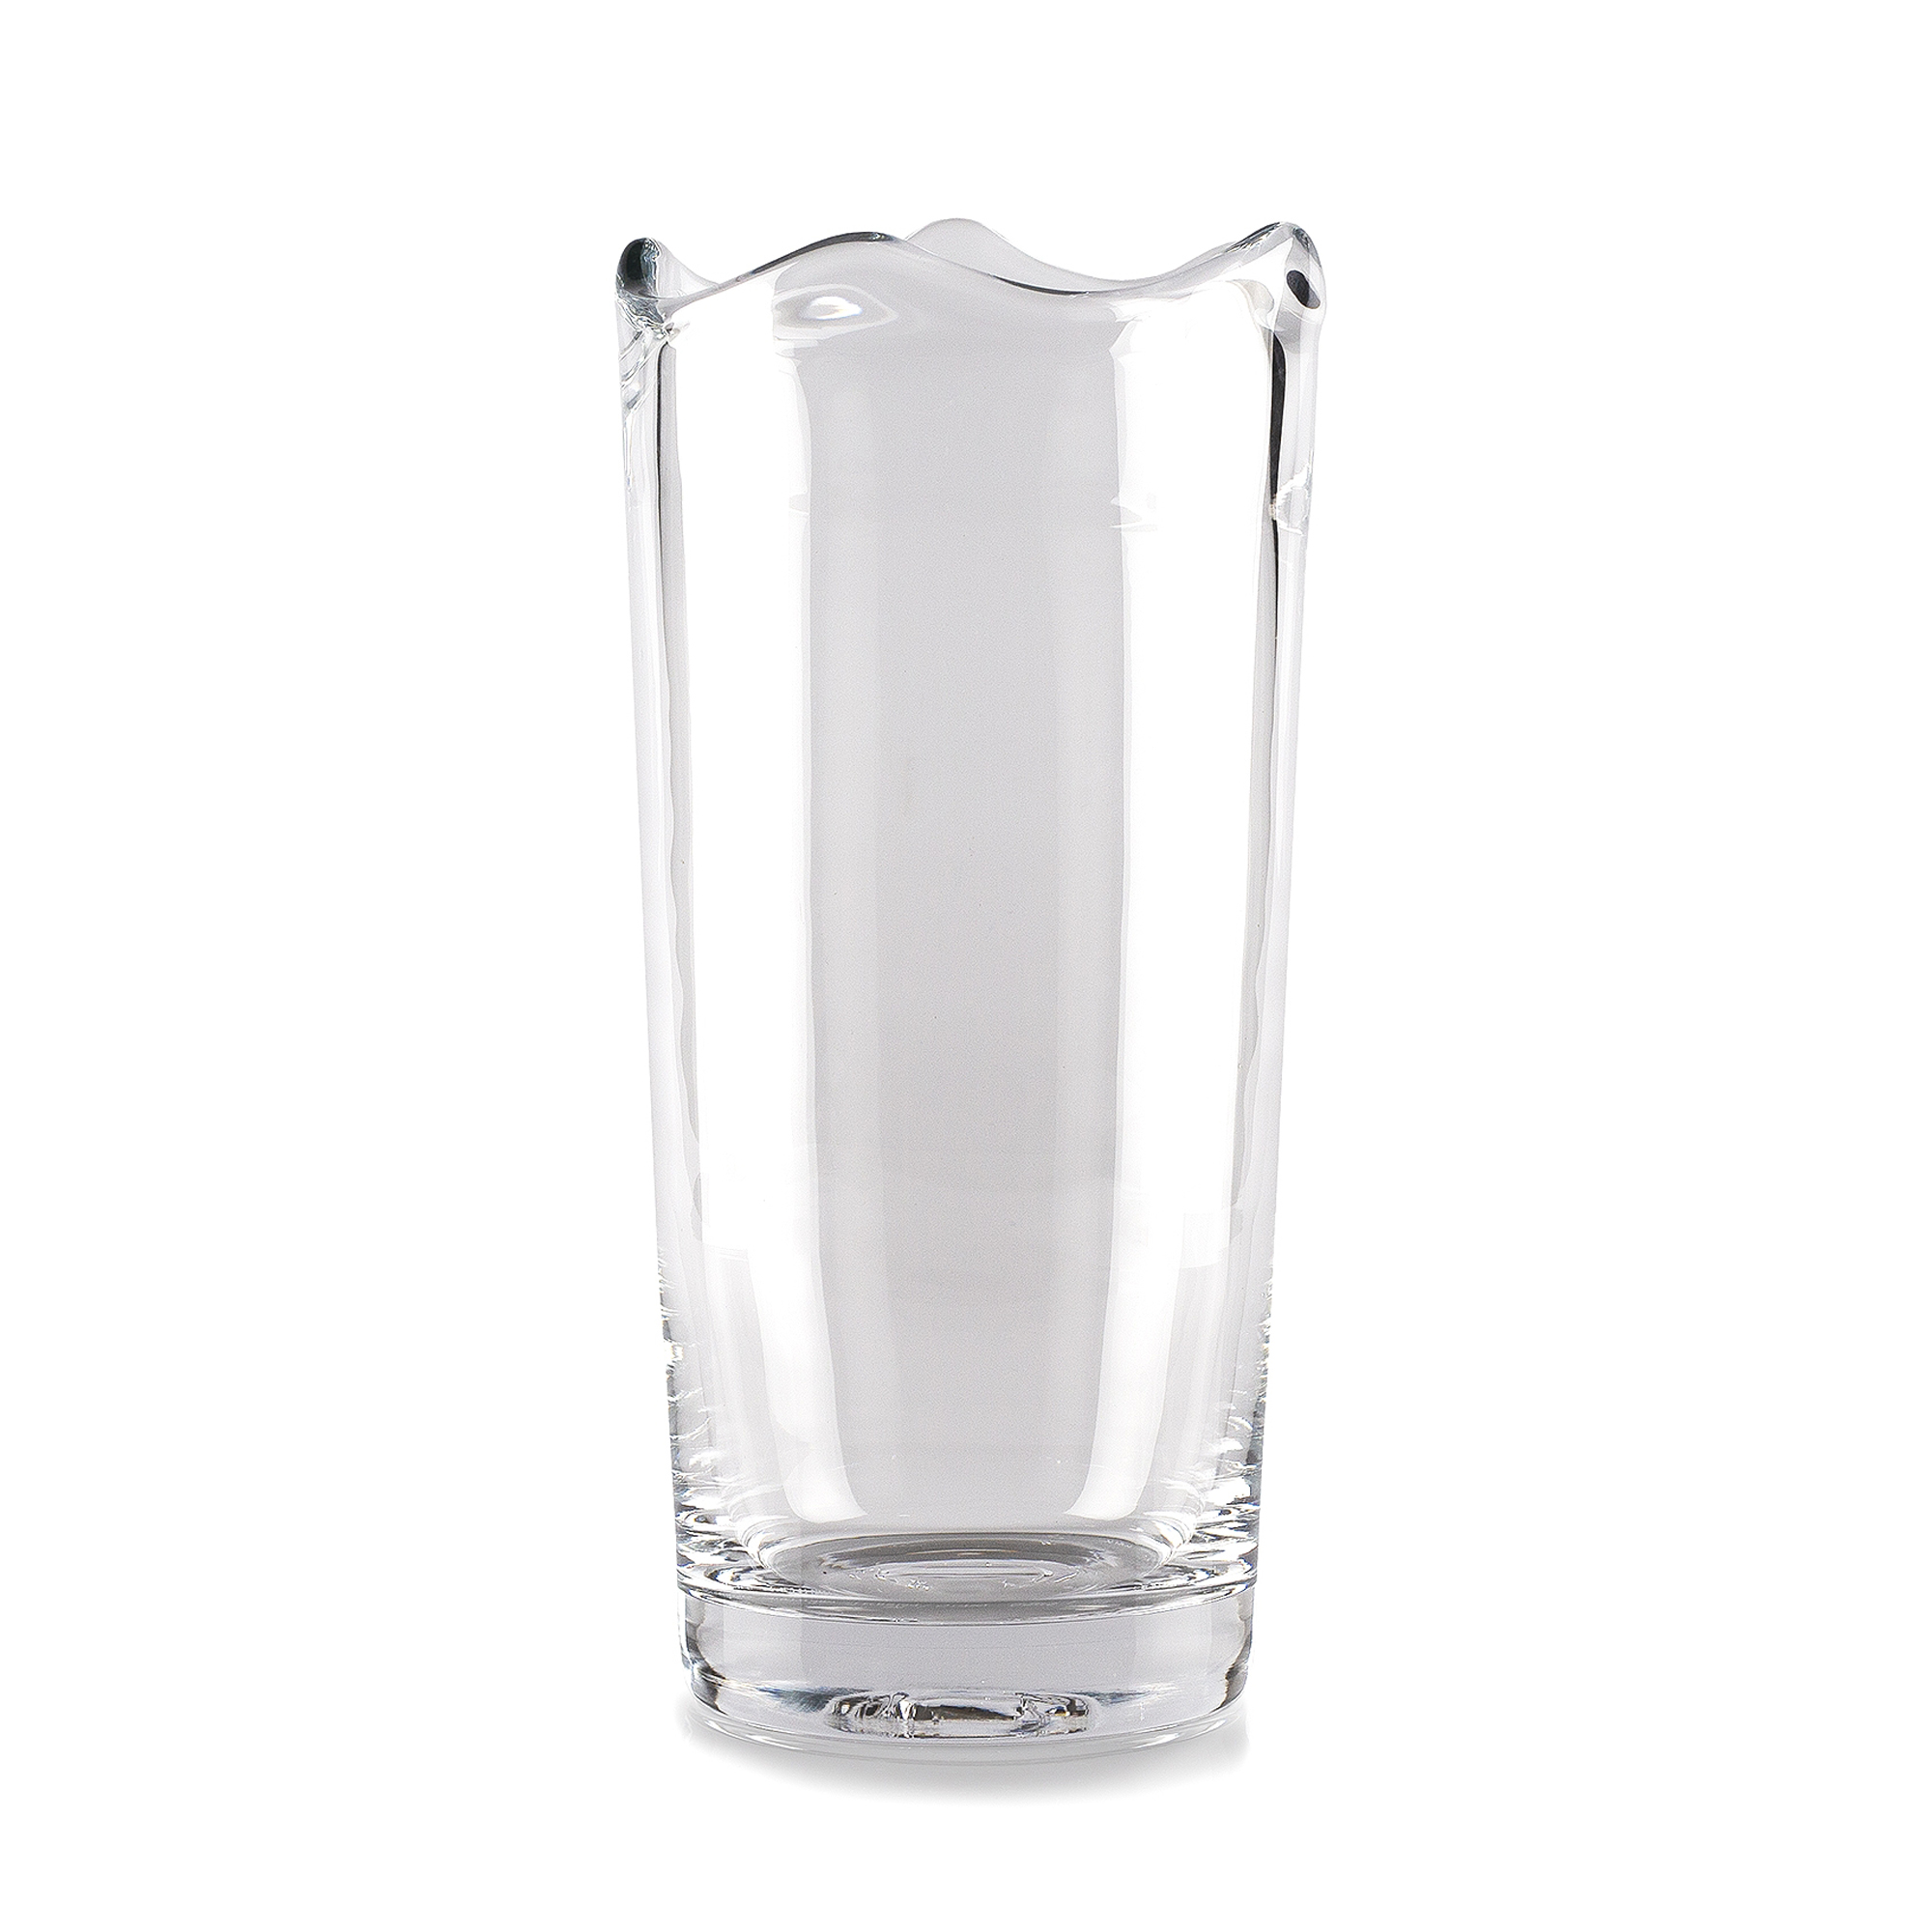 Vas Våg stor klarglas